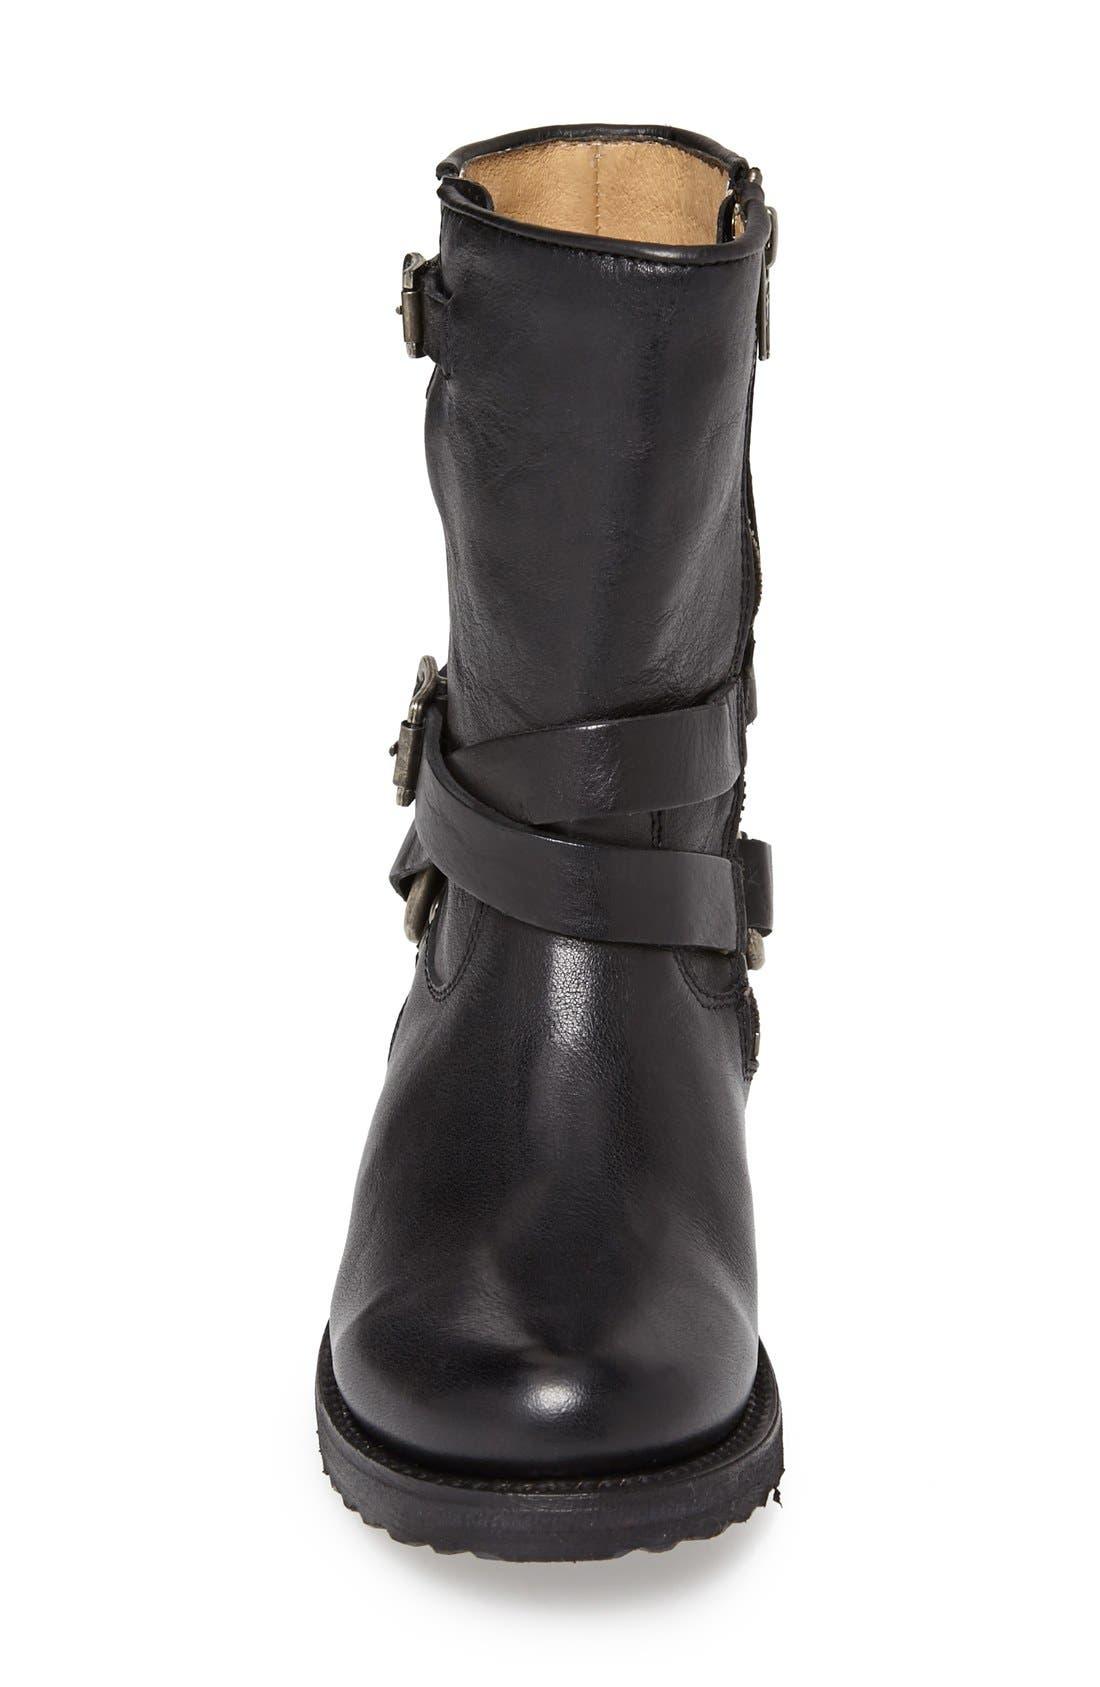 Alternate Image 3  - Frye 'Veronica' Crisscross Strap Short Leather Boot (Women)